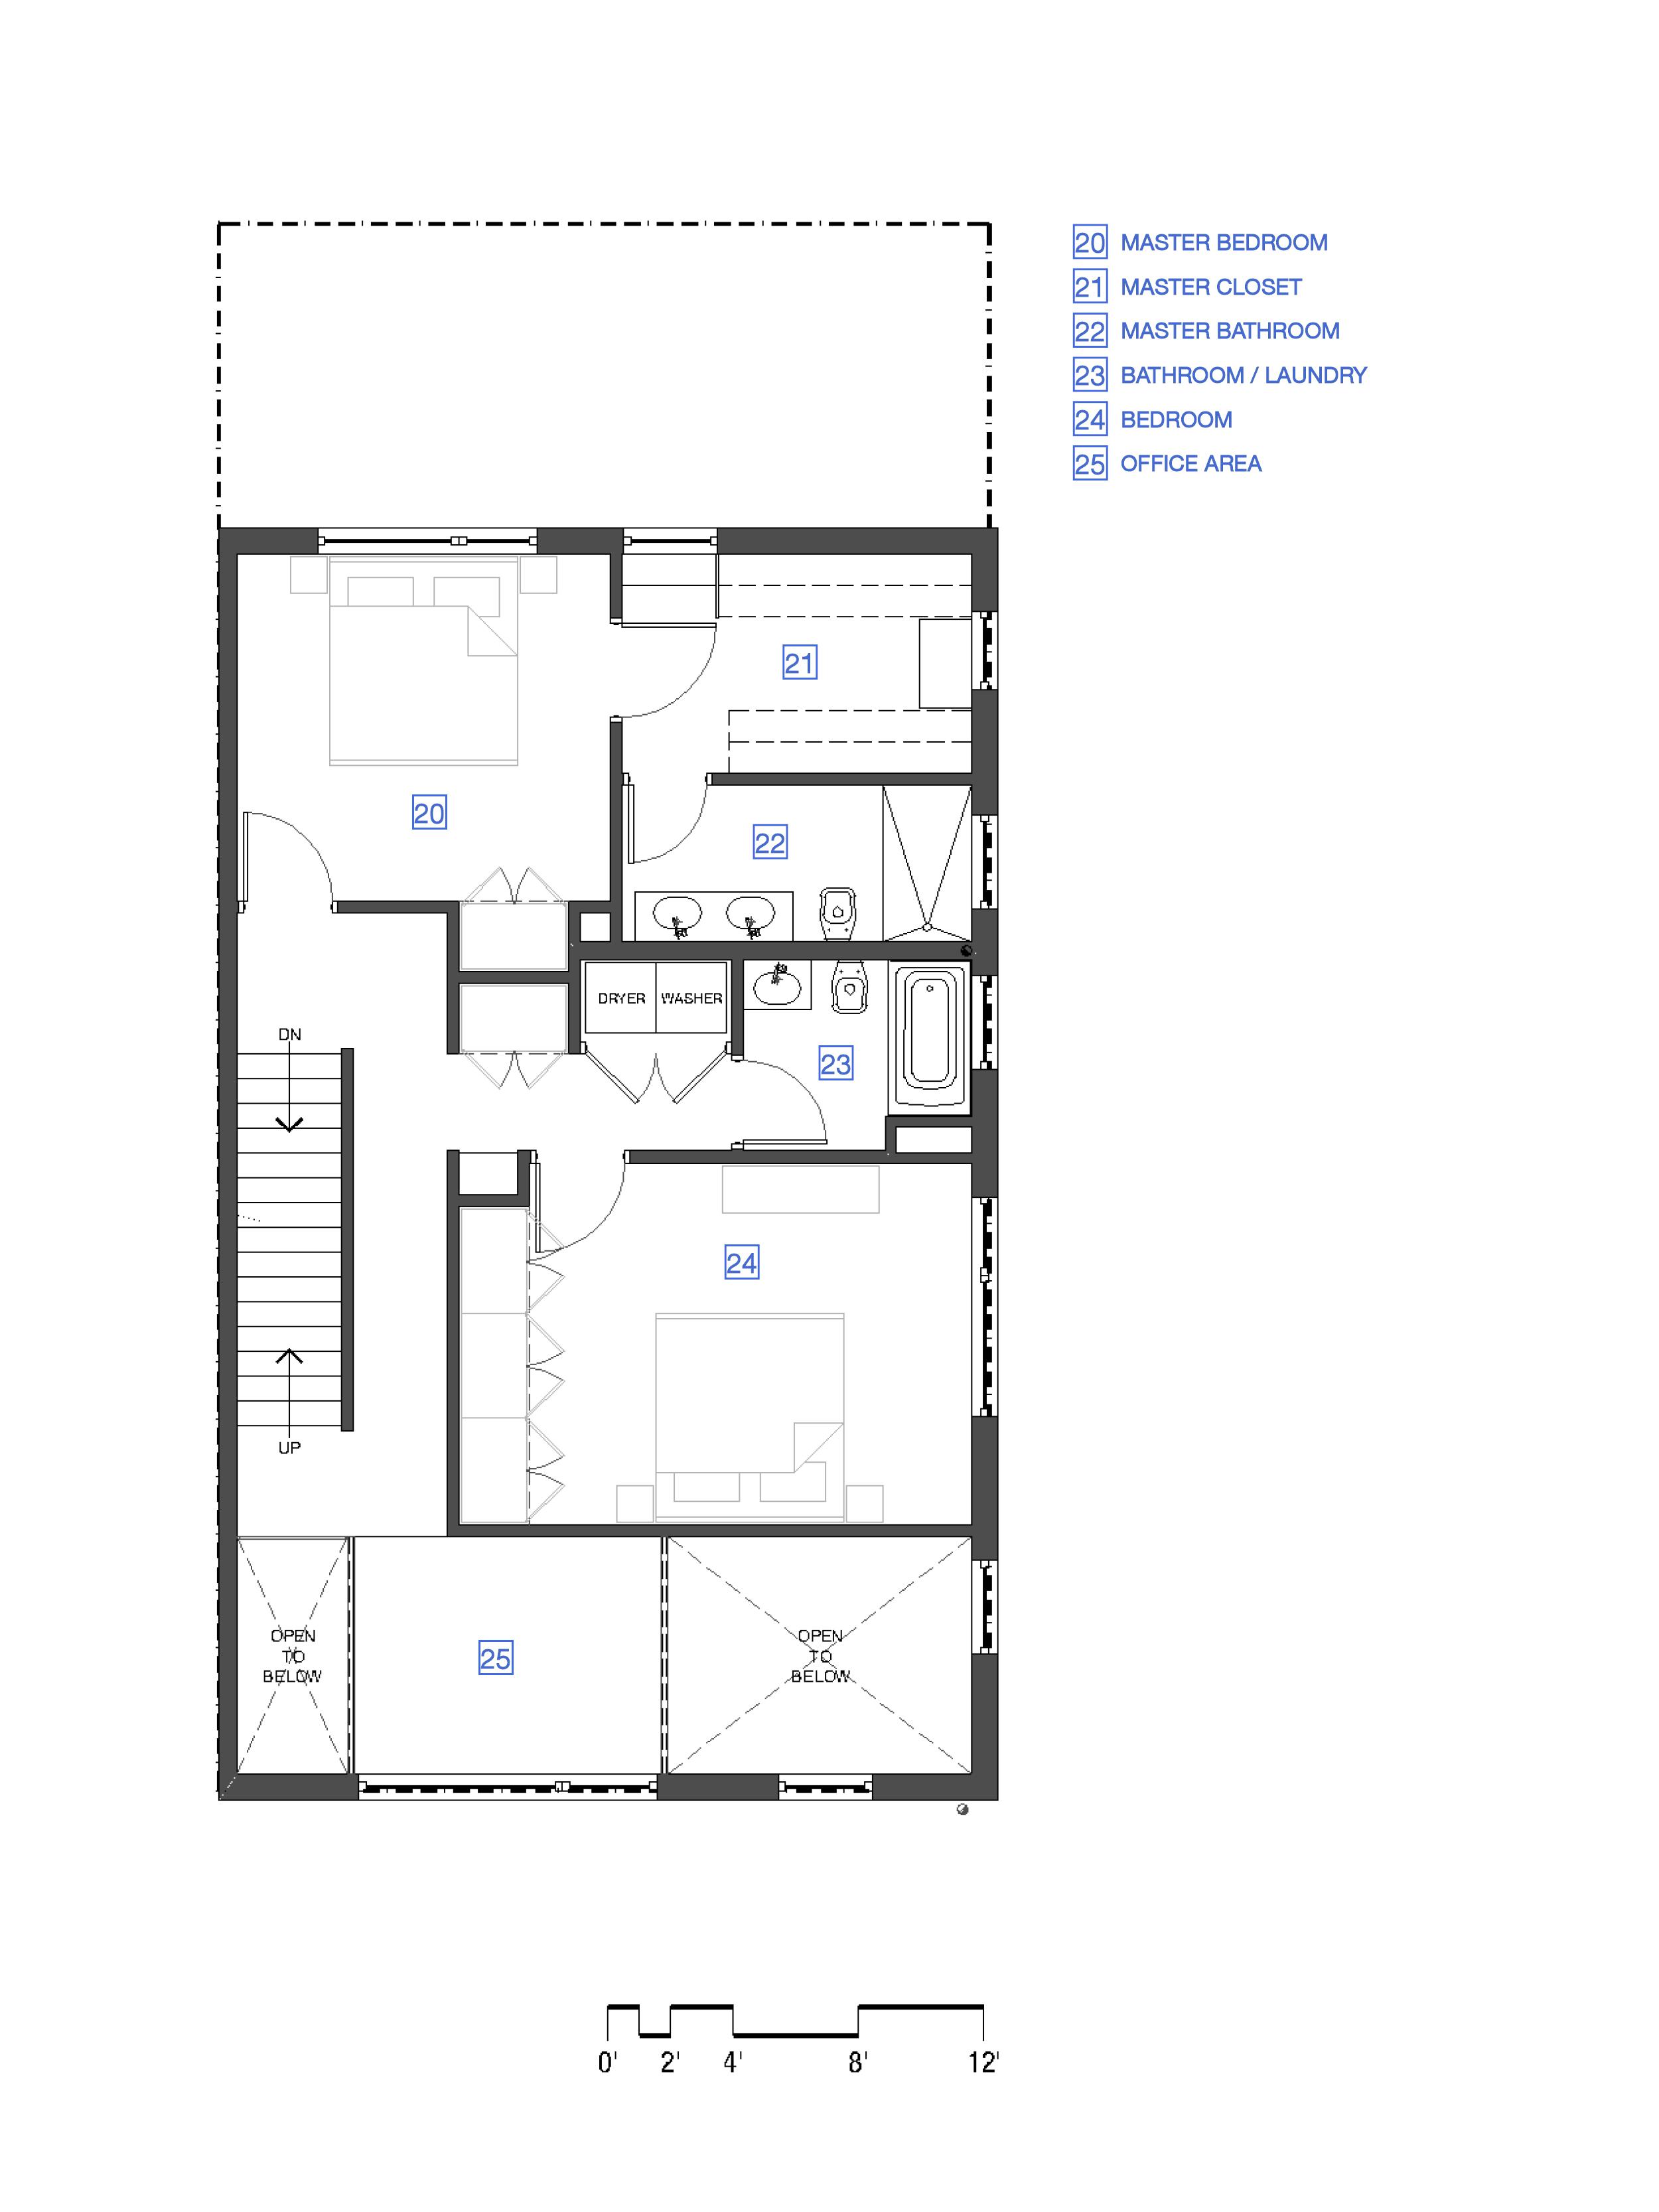 3rd Floor - Unit 'B'